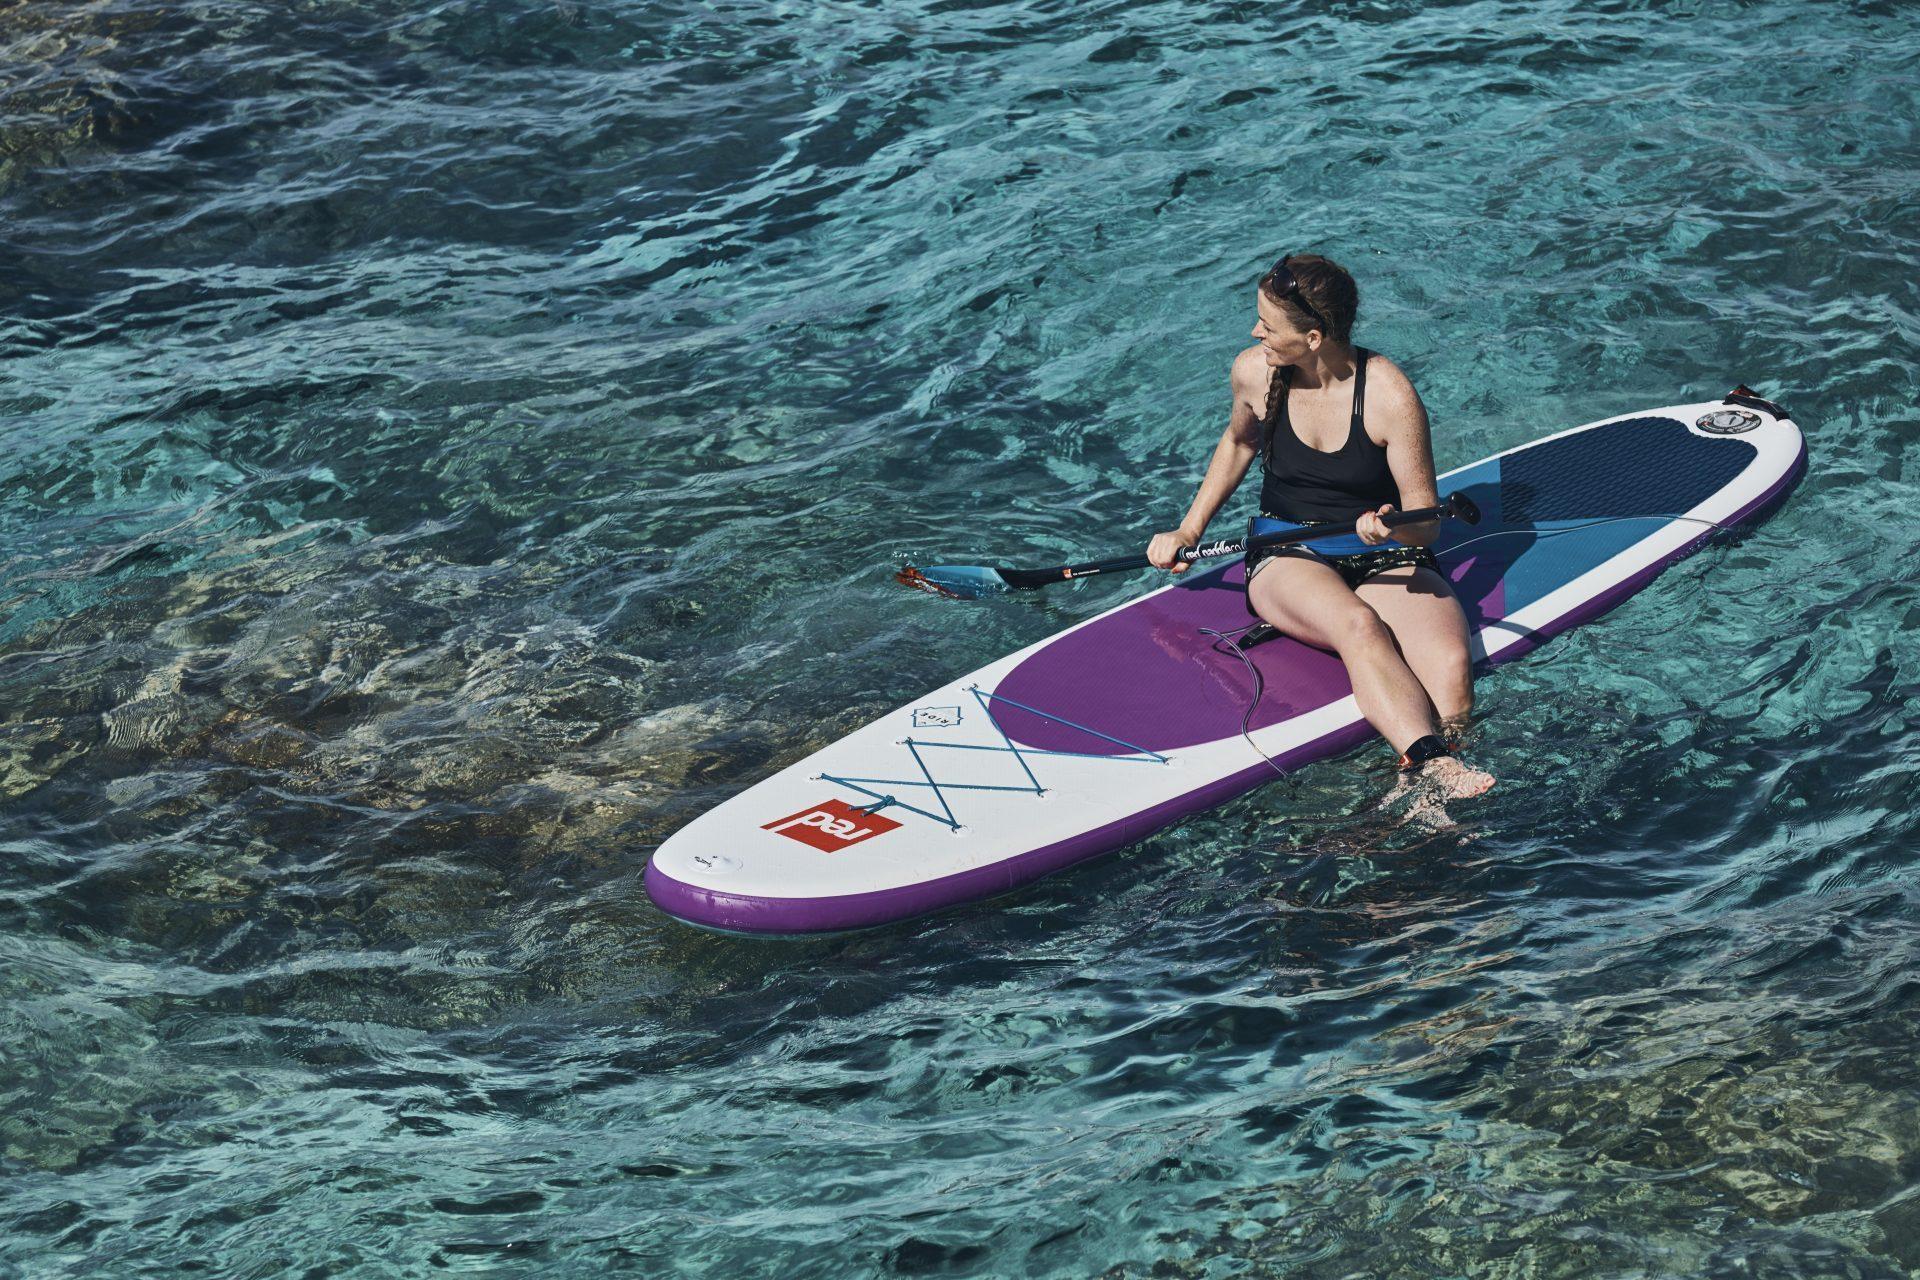 Red Paddle Ride - nova vijolična barva